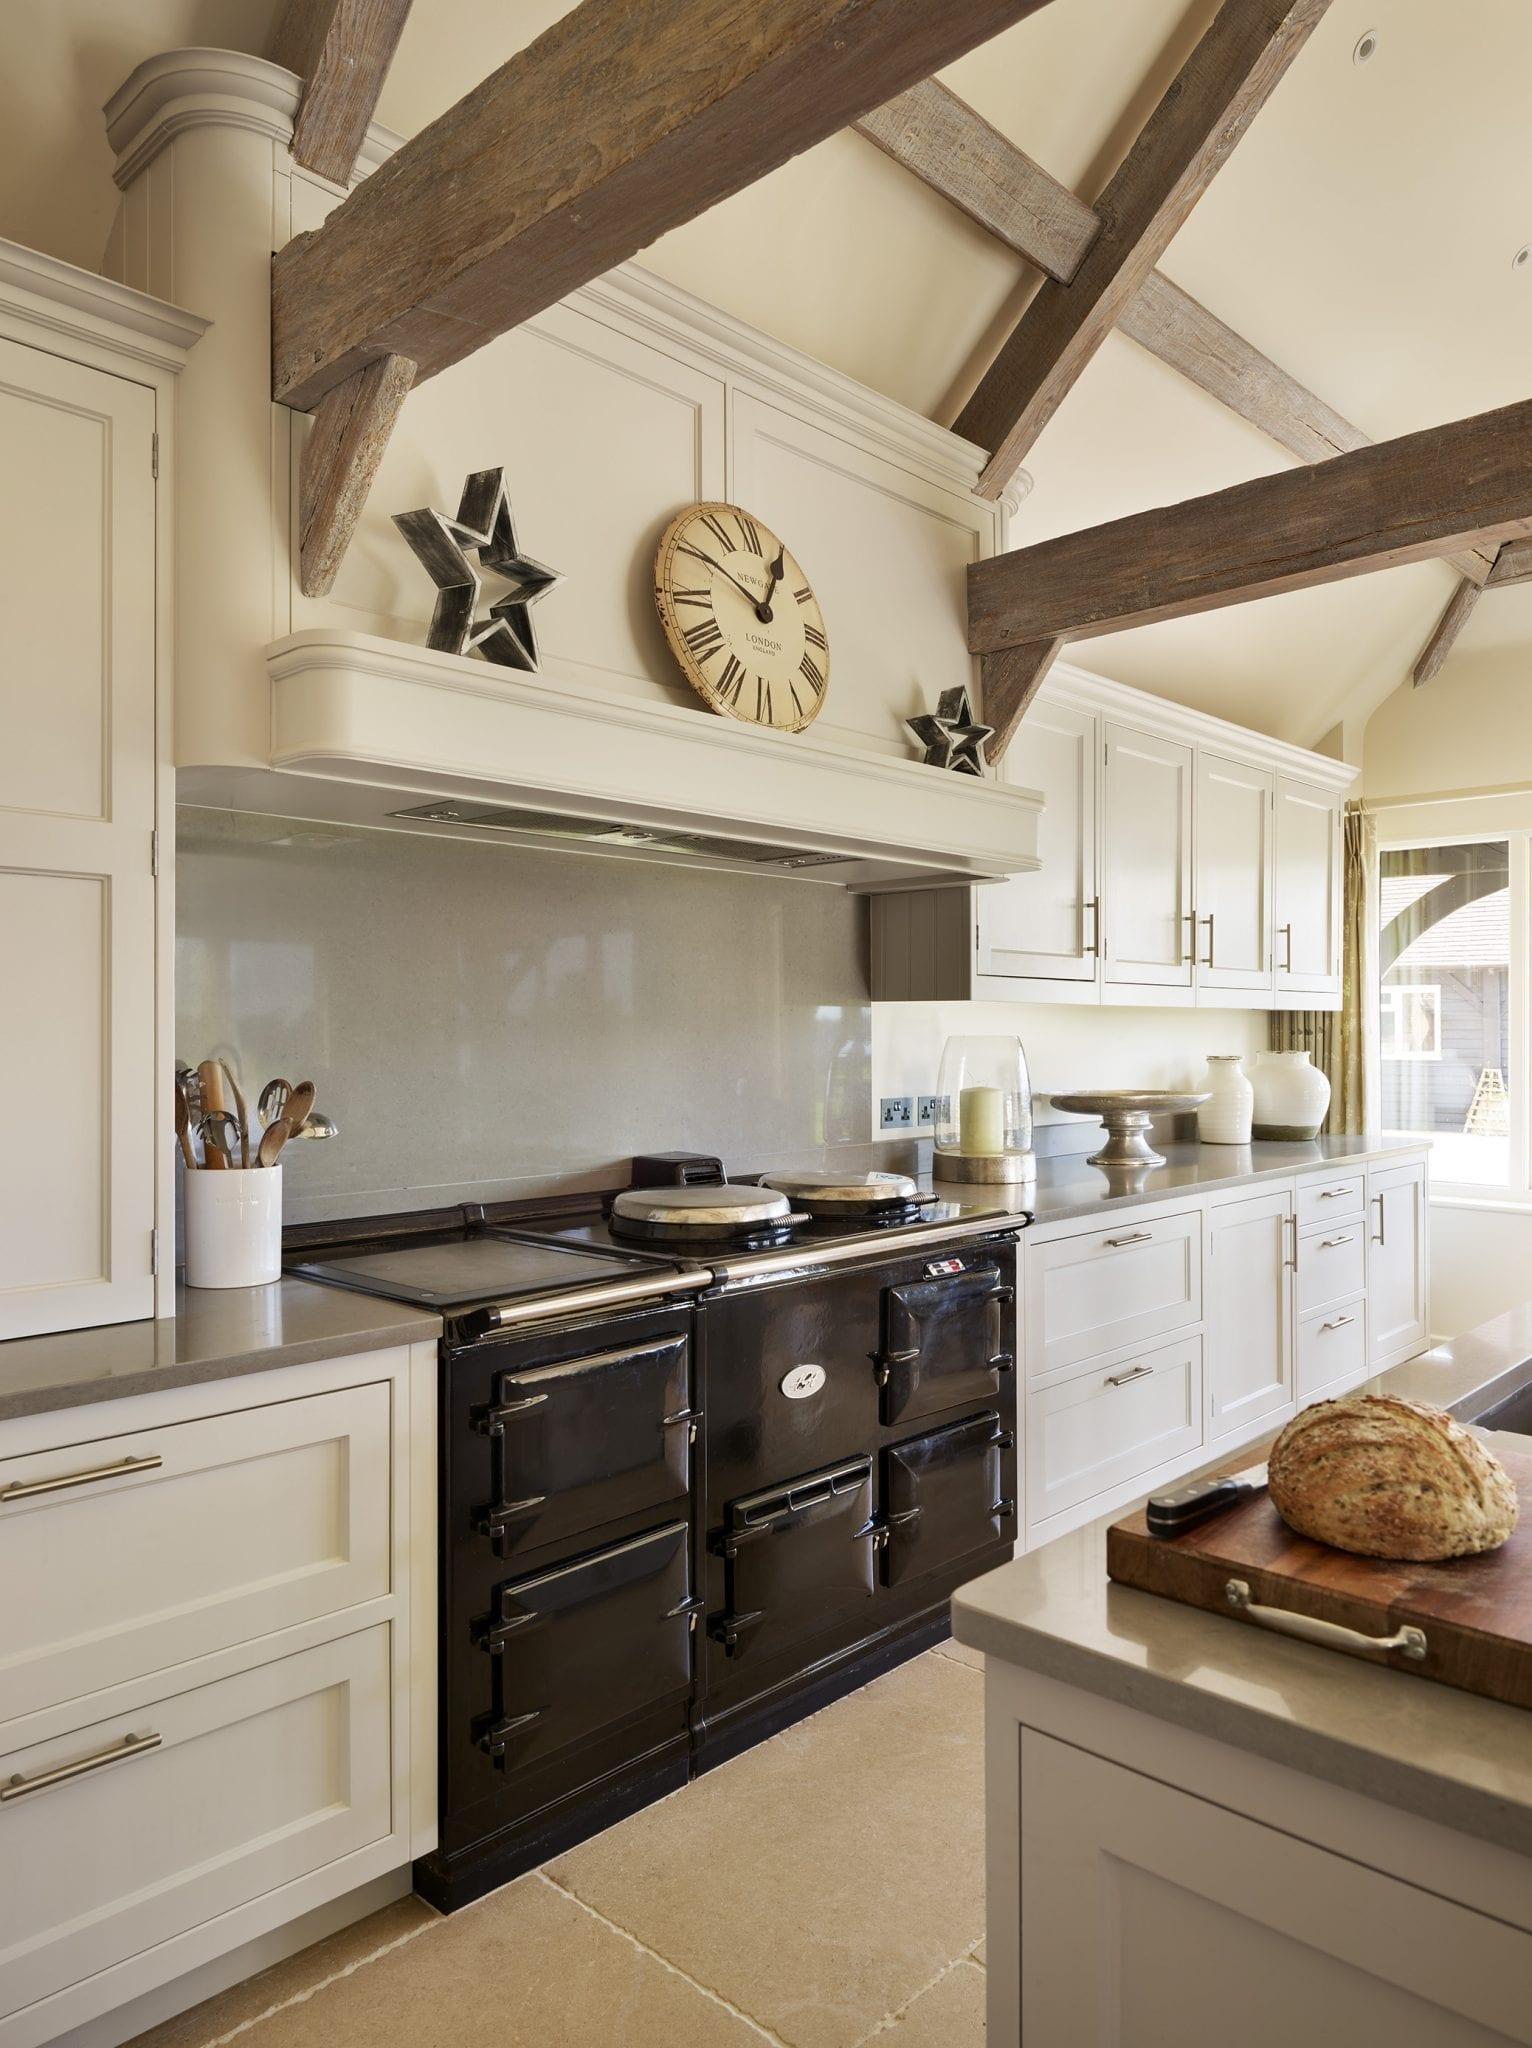 When Is A Bespoke Kitchen, Not A Bespoke Kitchen? -